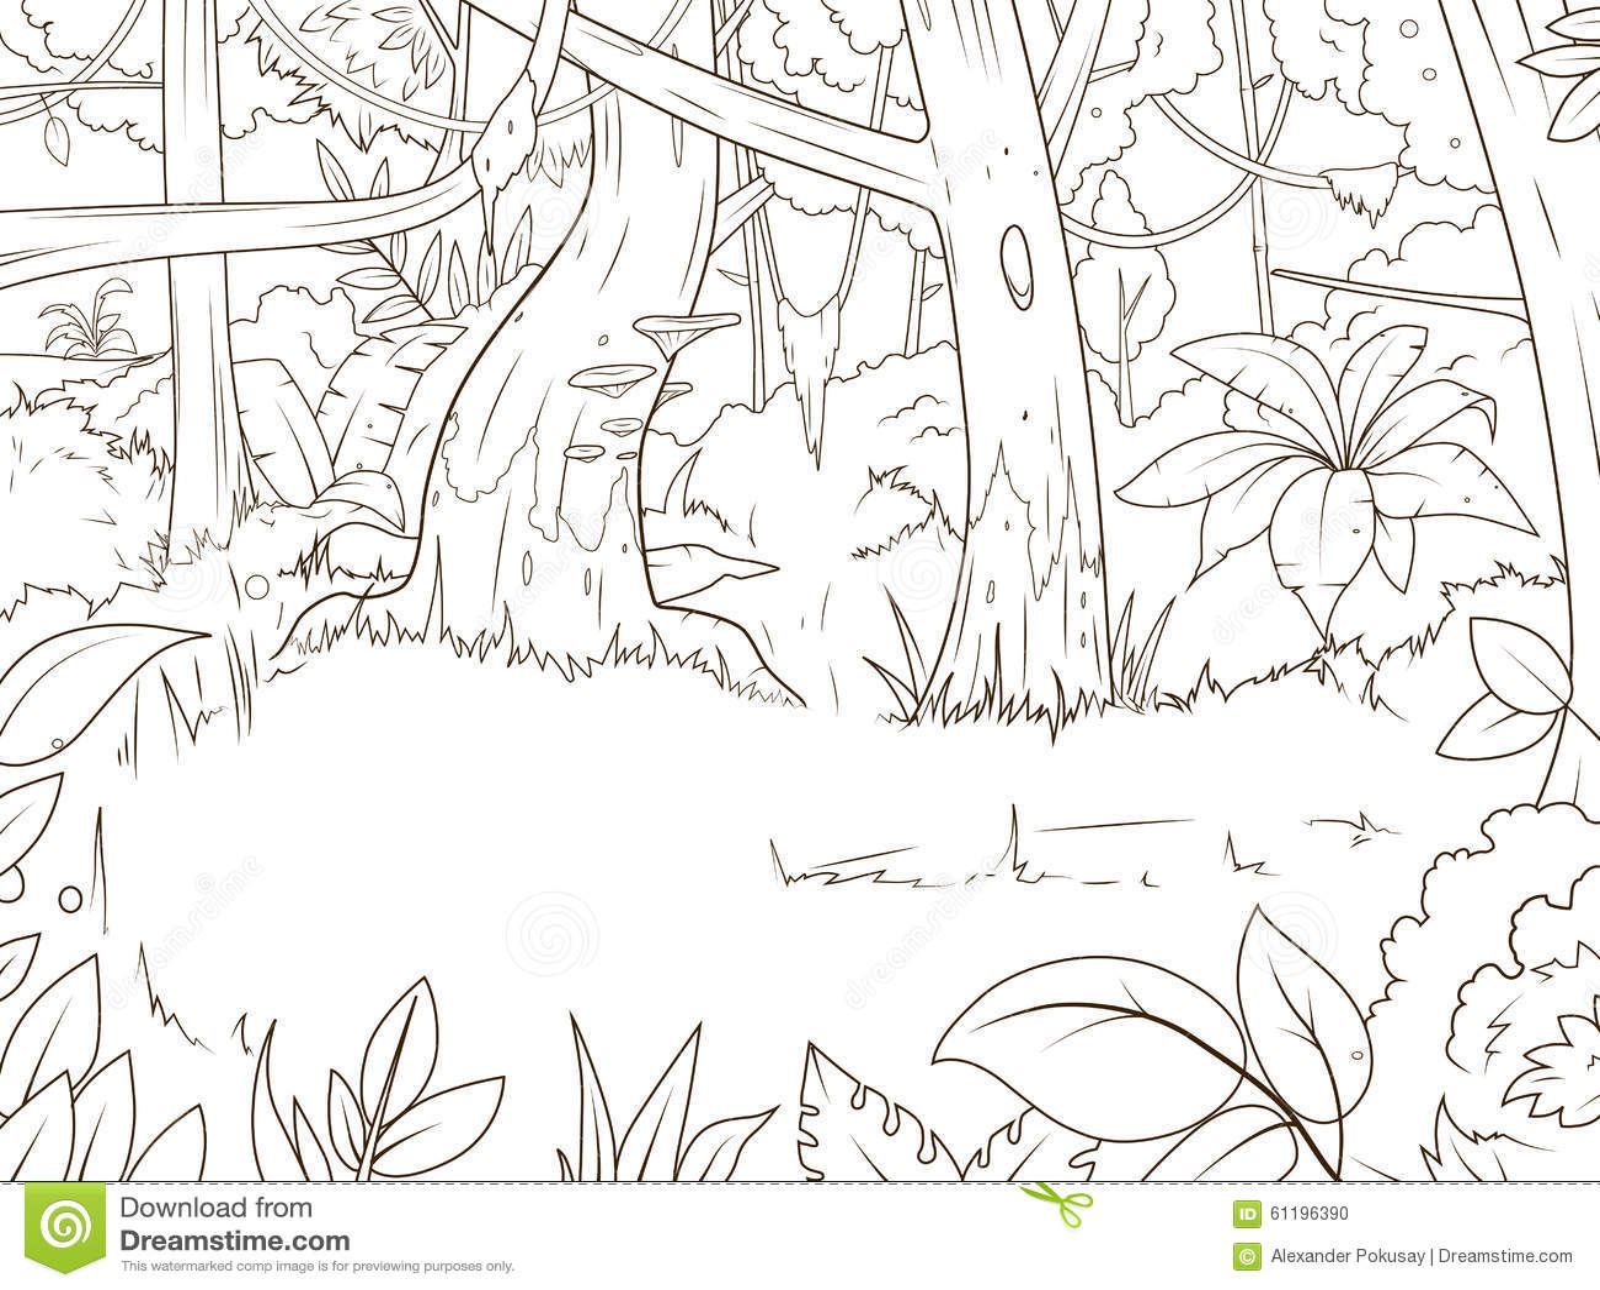 Jungle Forest Cartoon Coloring Book Vector Stock Vector